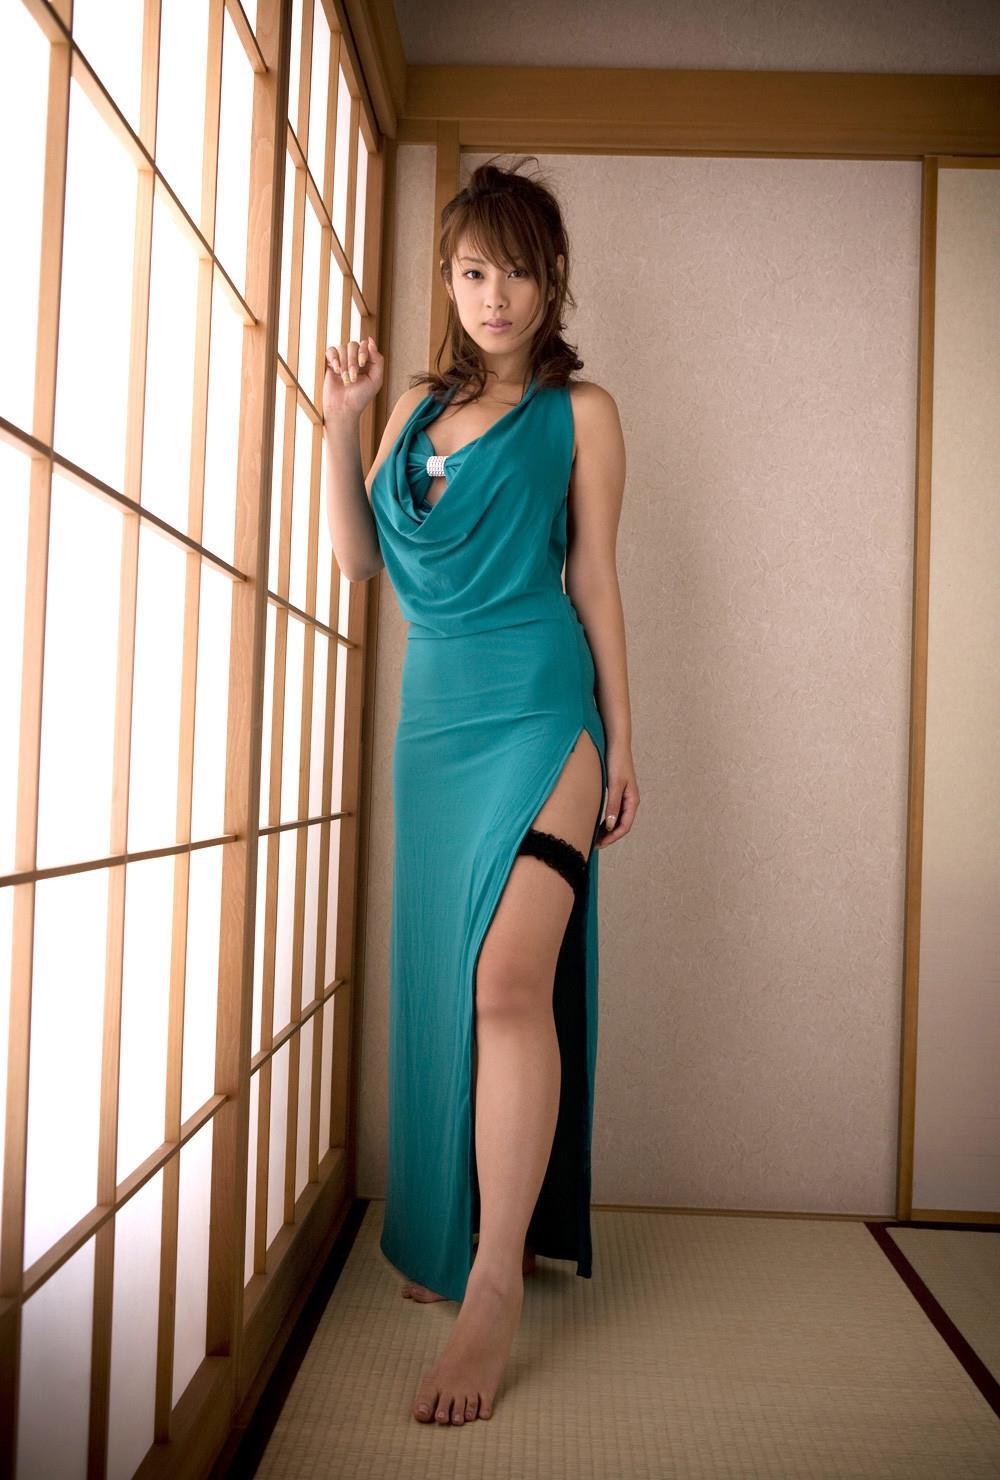 野田彩加 エロ画像 63